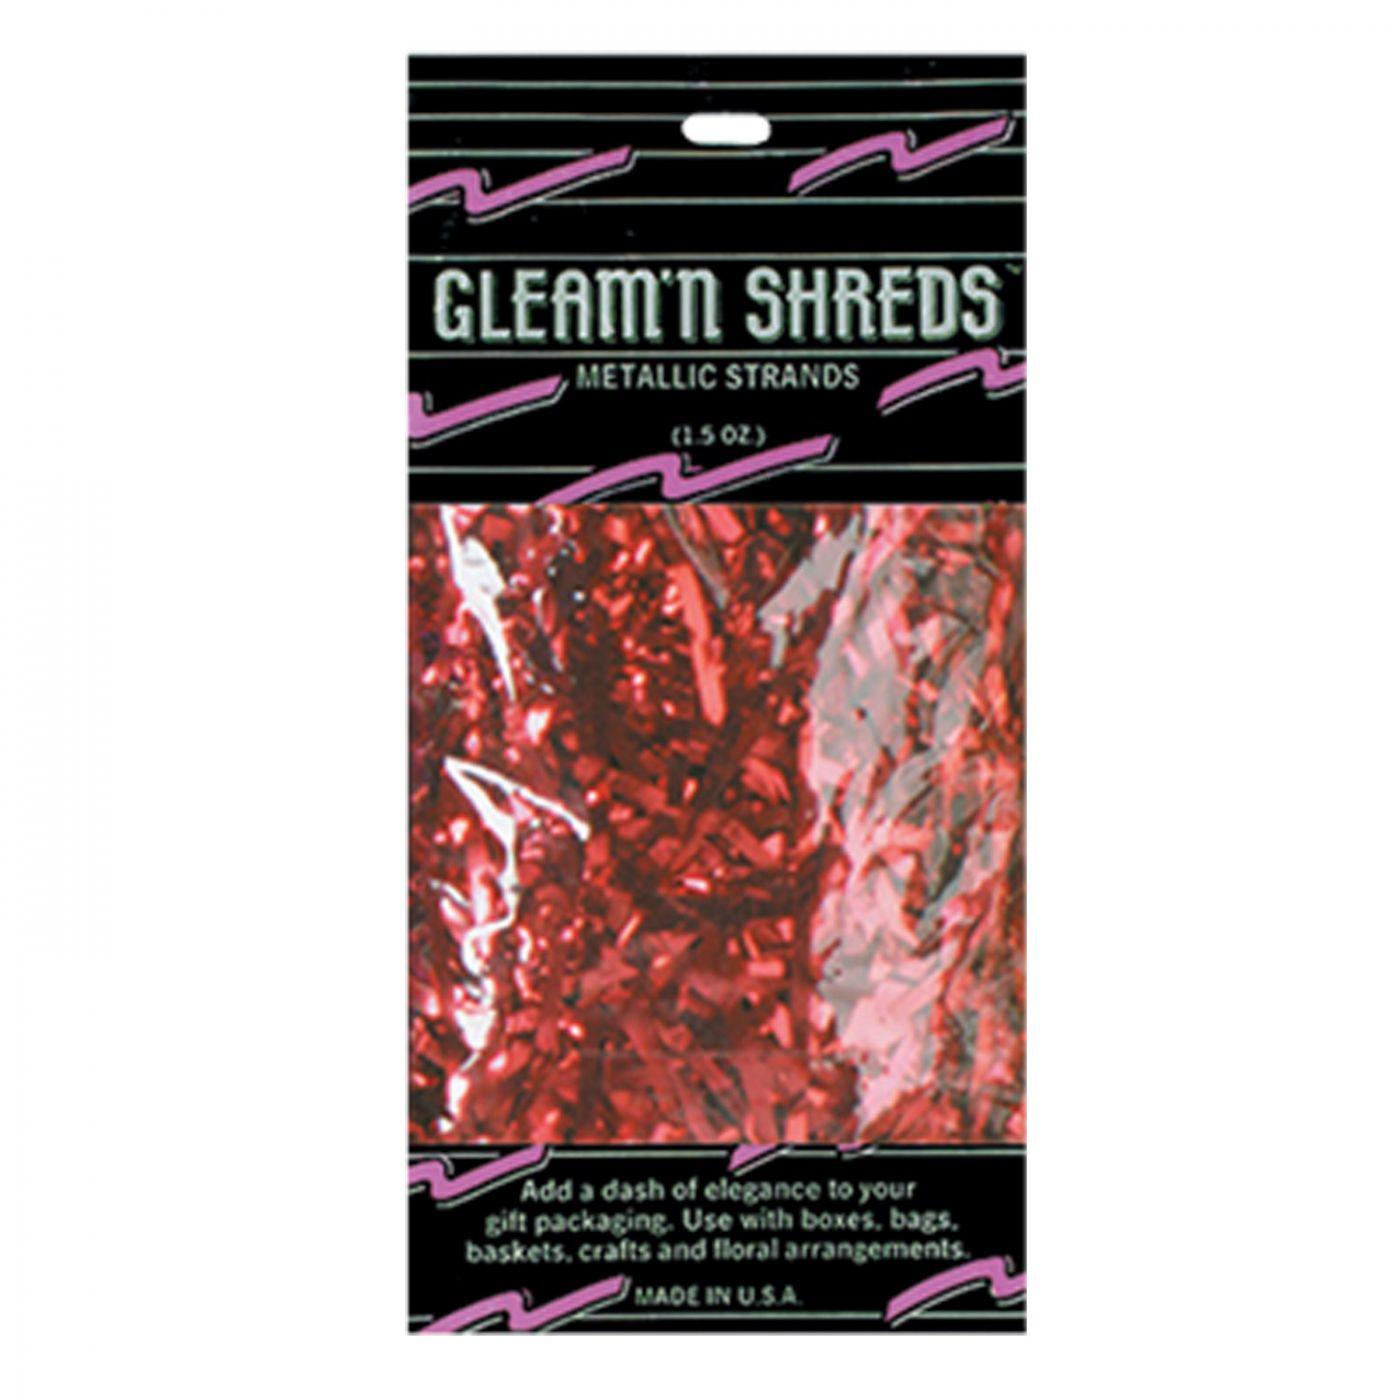 Gleam 'N Shreds Metallic Strands image